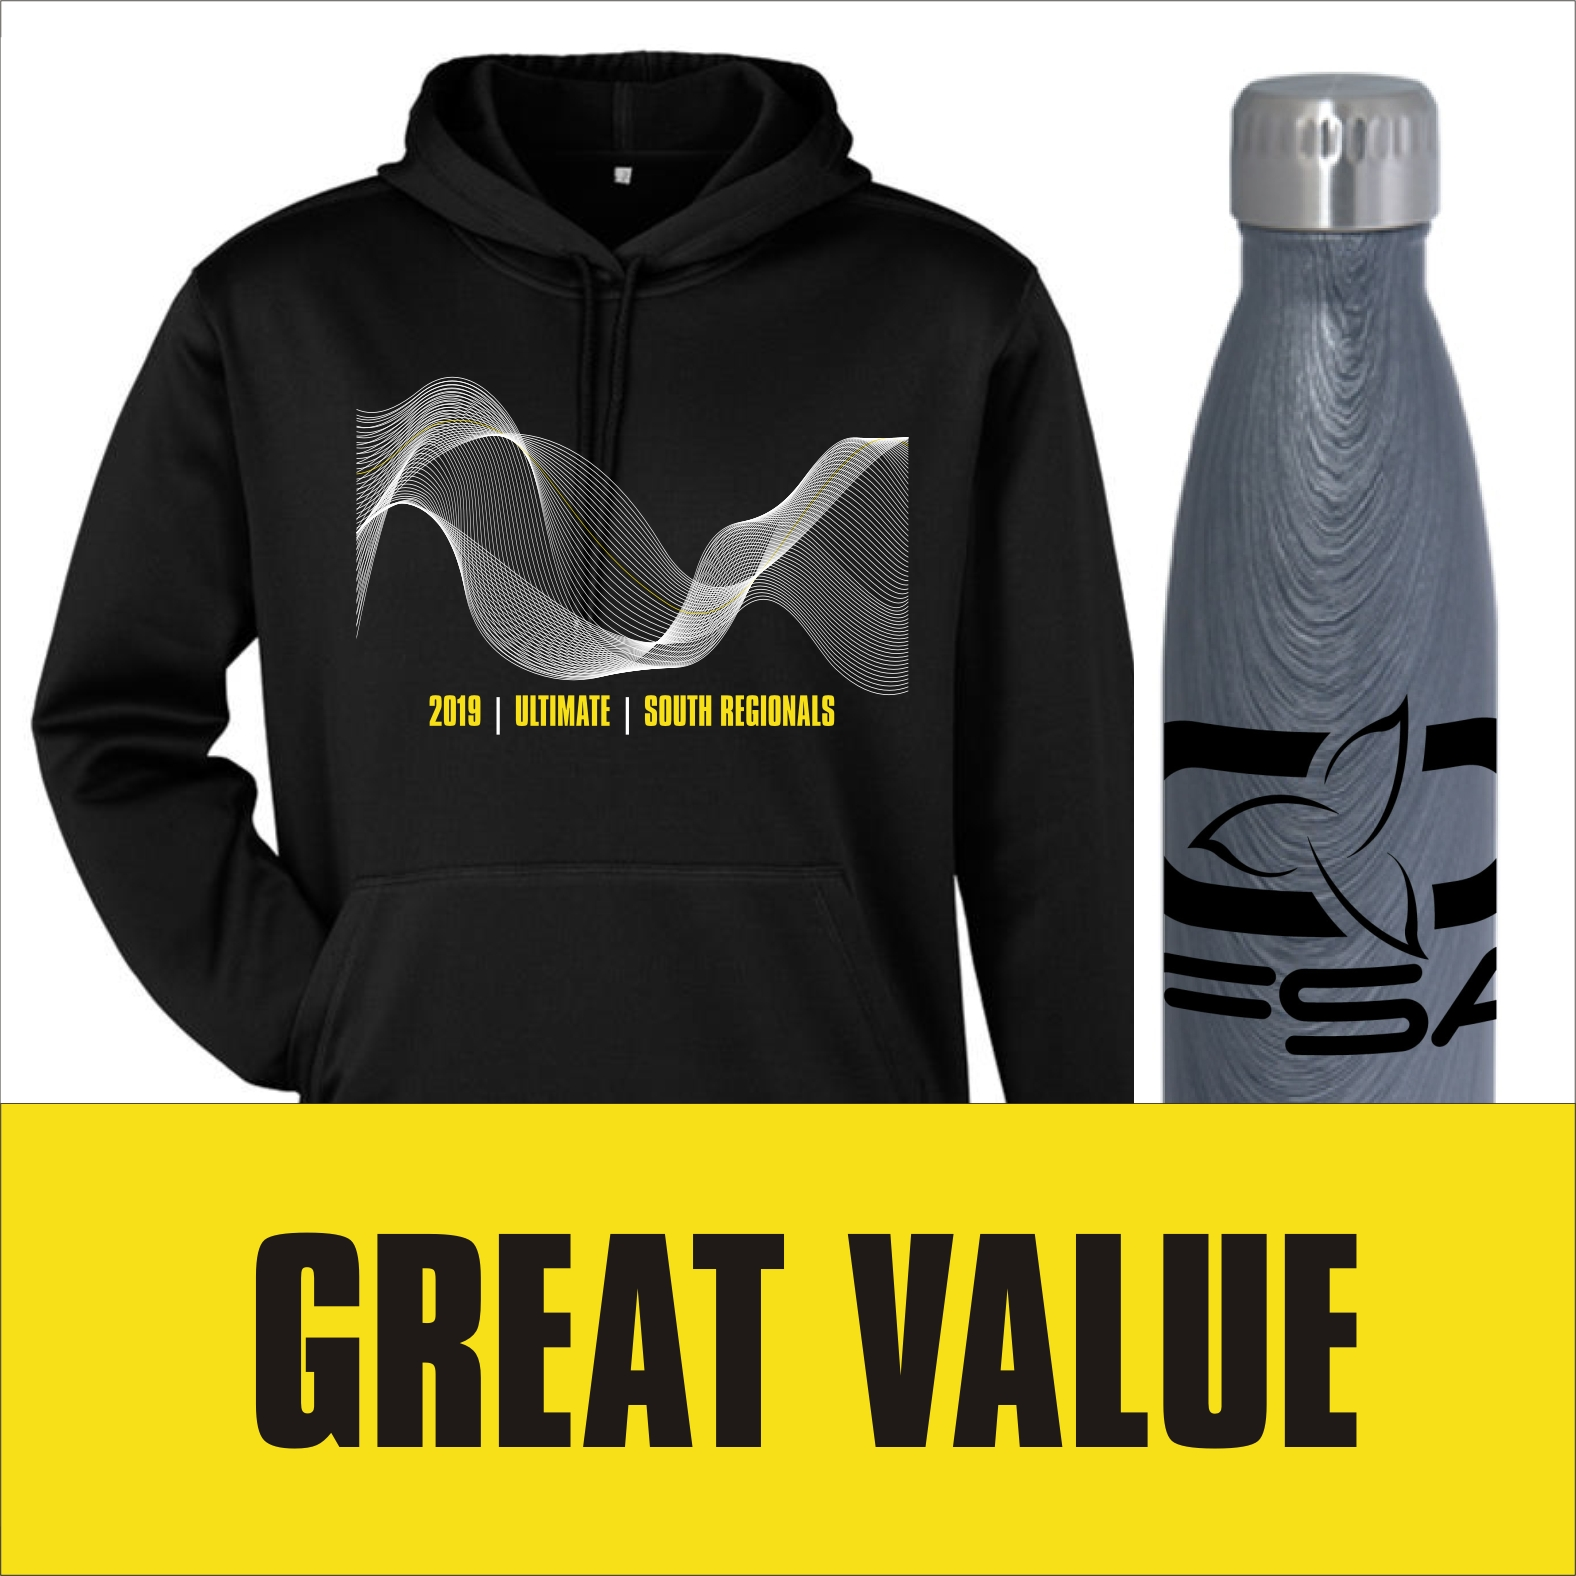 2018 Ultimate Bottle bundle.jpg